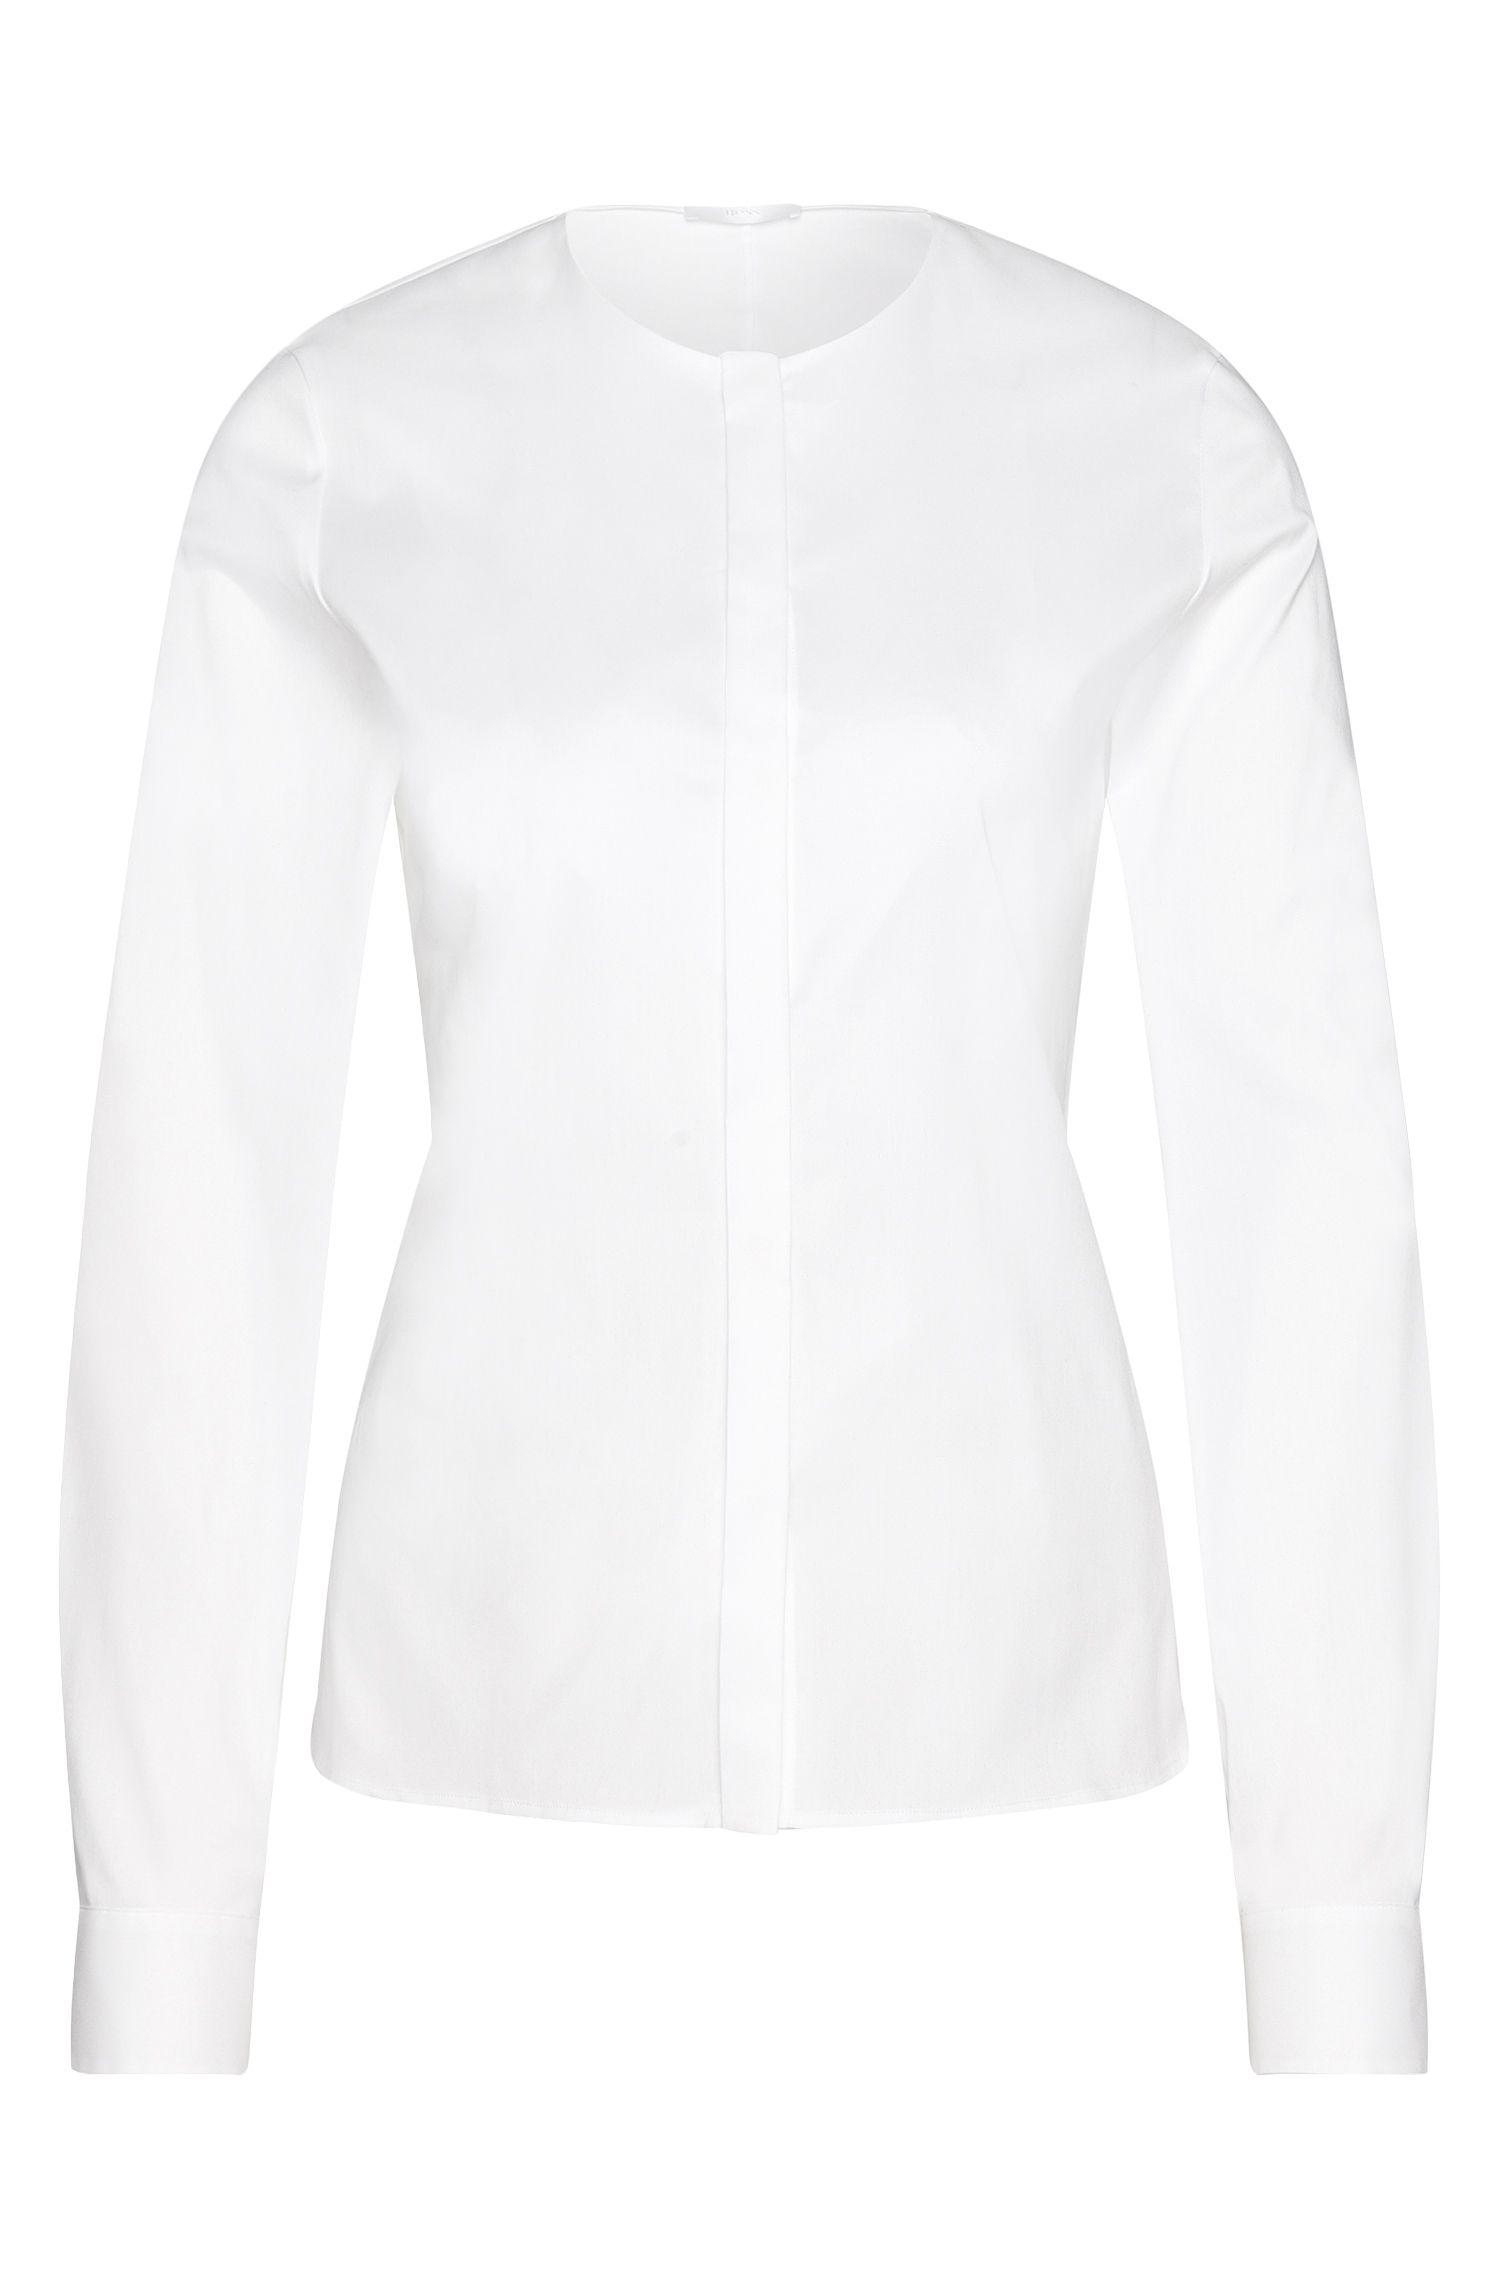 'Binana' | Cotton Blend Tie Waist Poplin Blouse